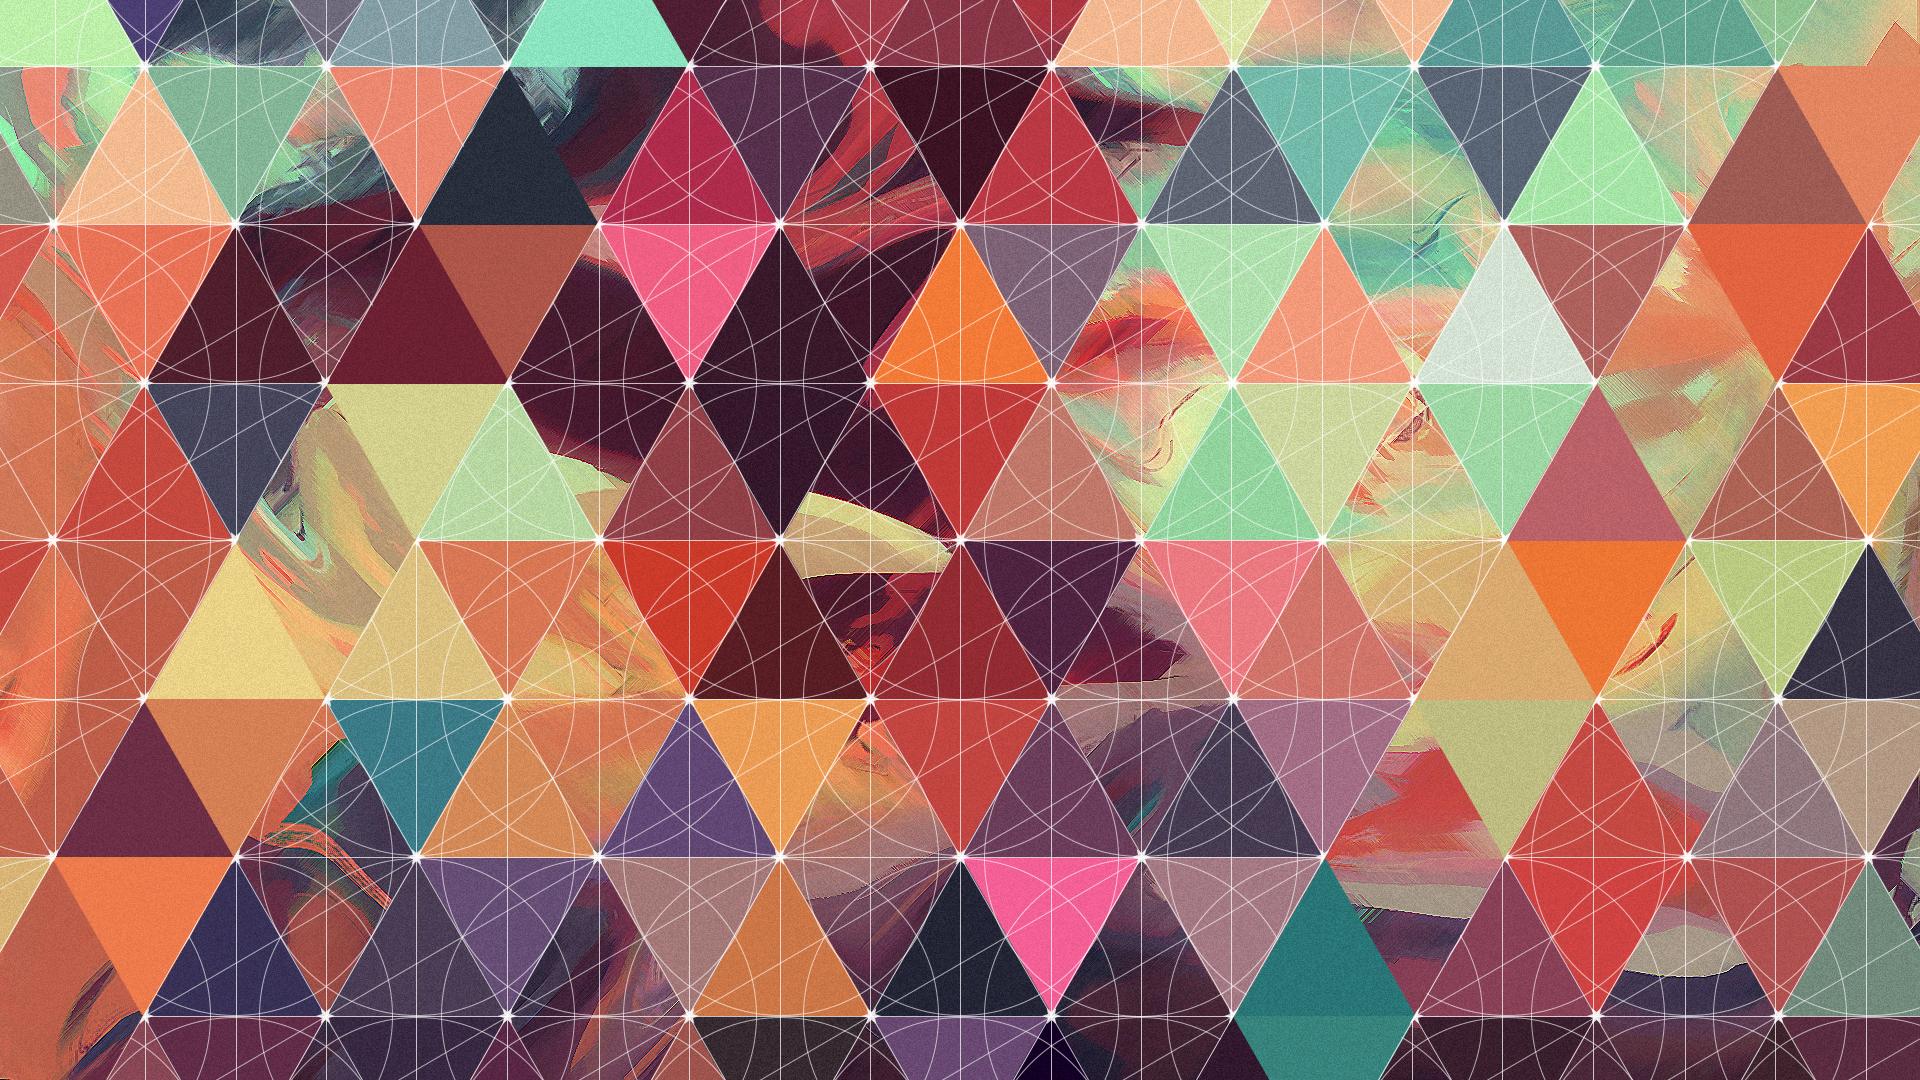 geometric hd wallpaper widescreen 1920x1080 - photo #2